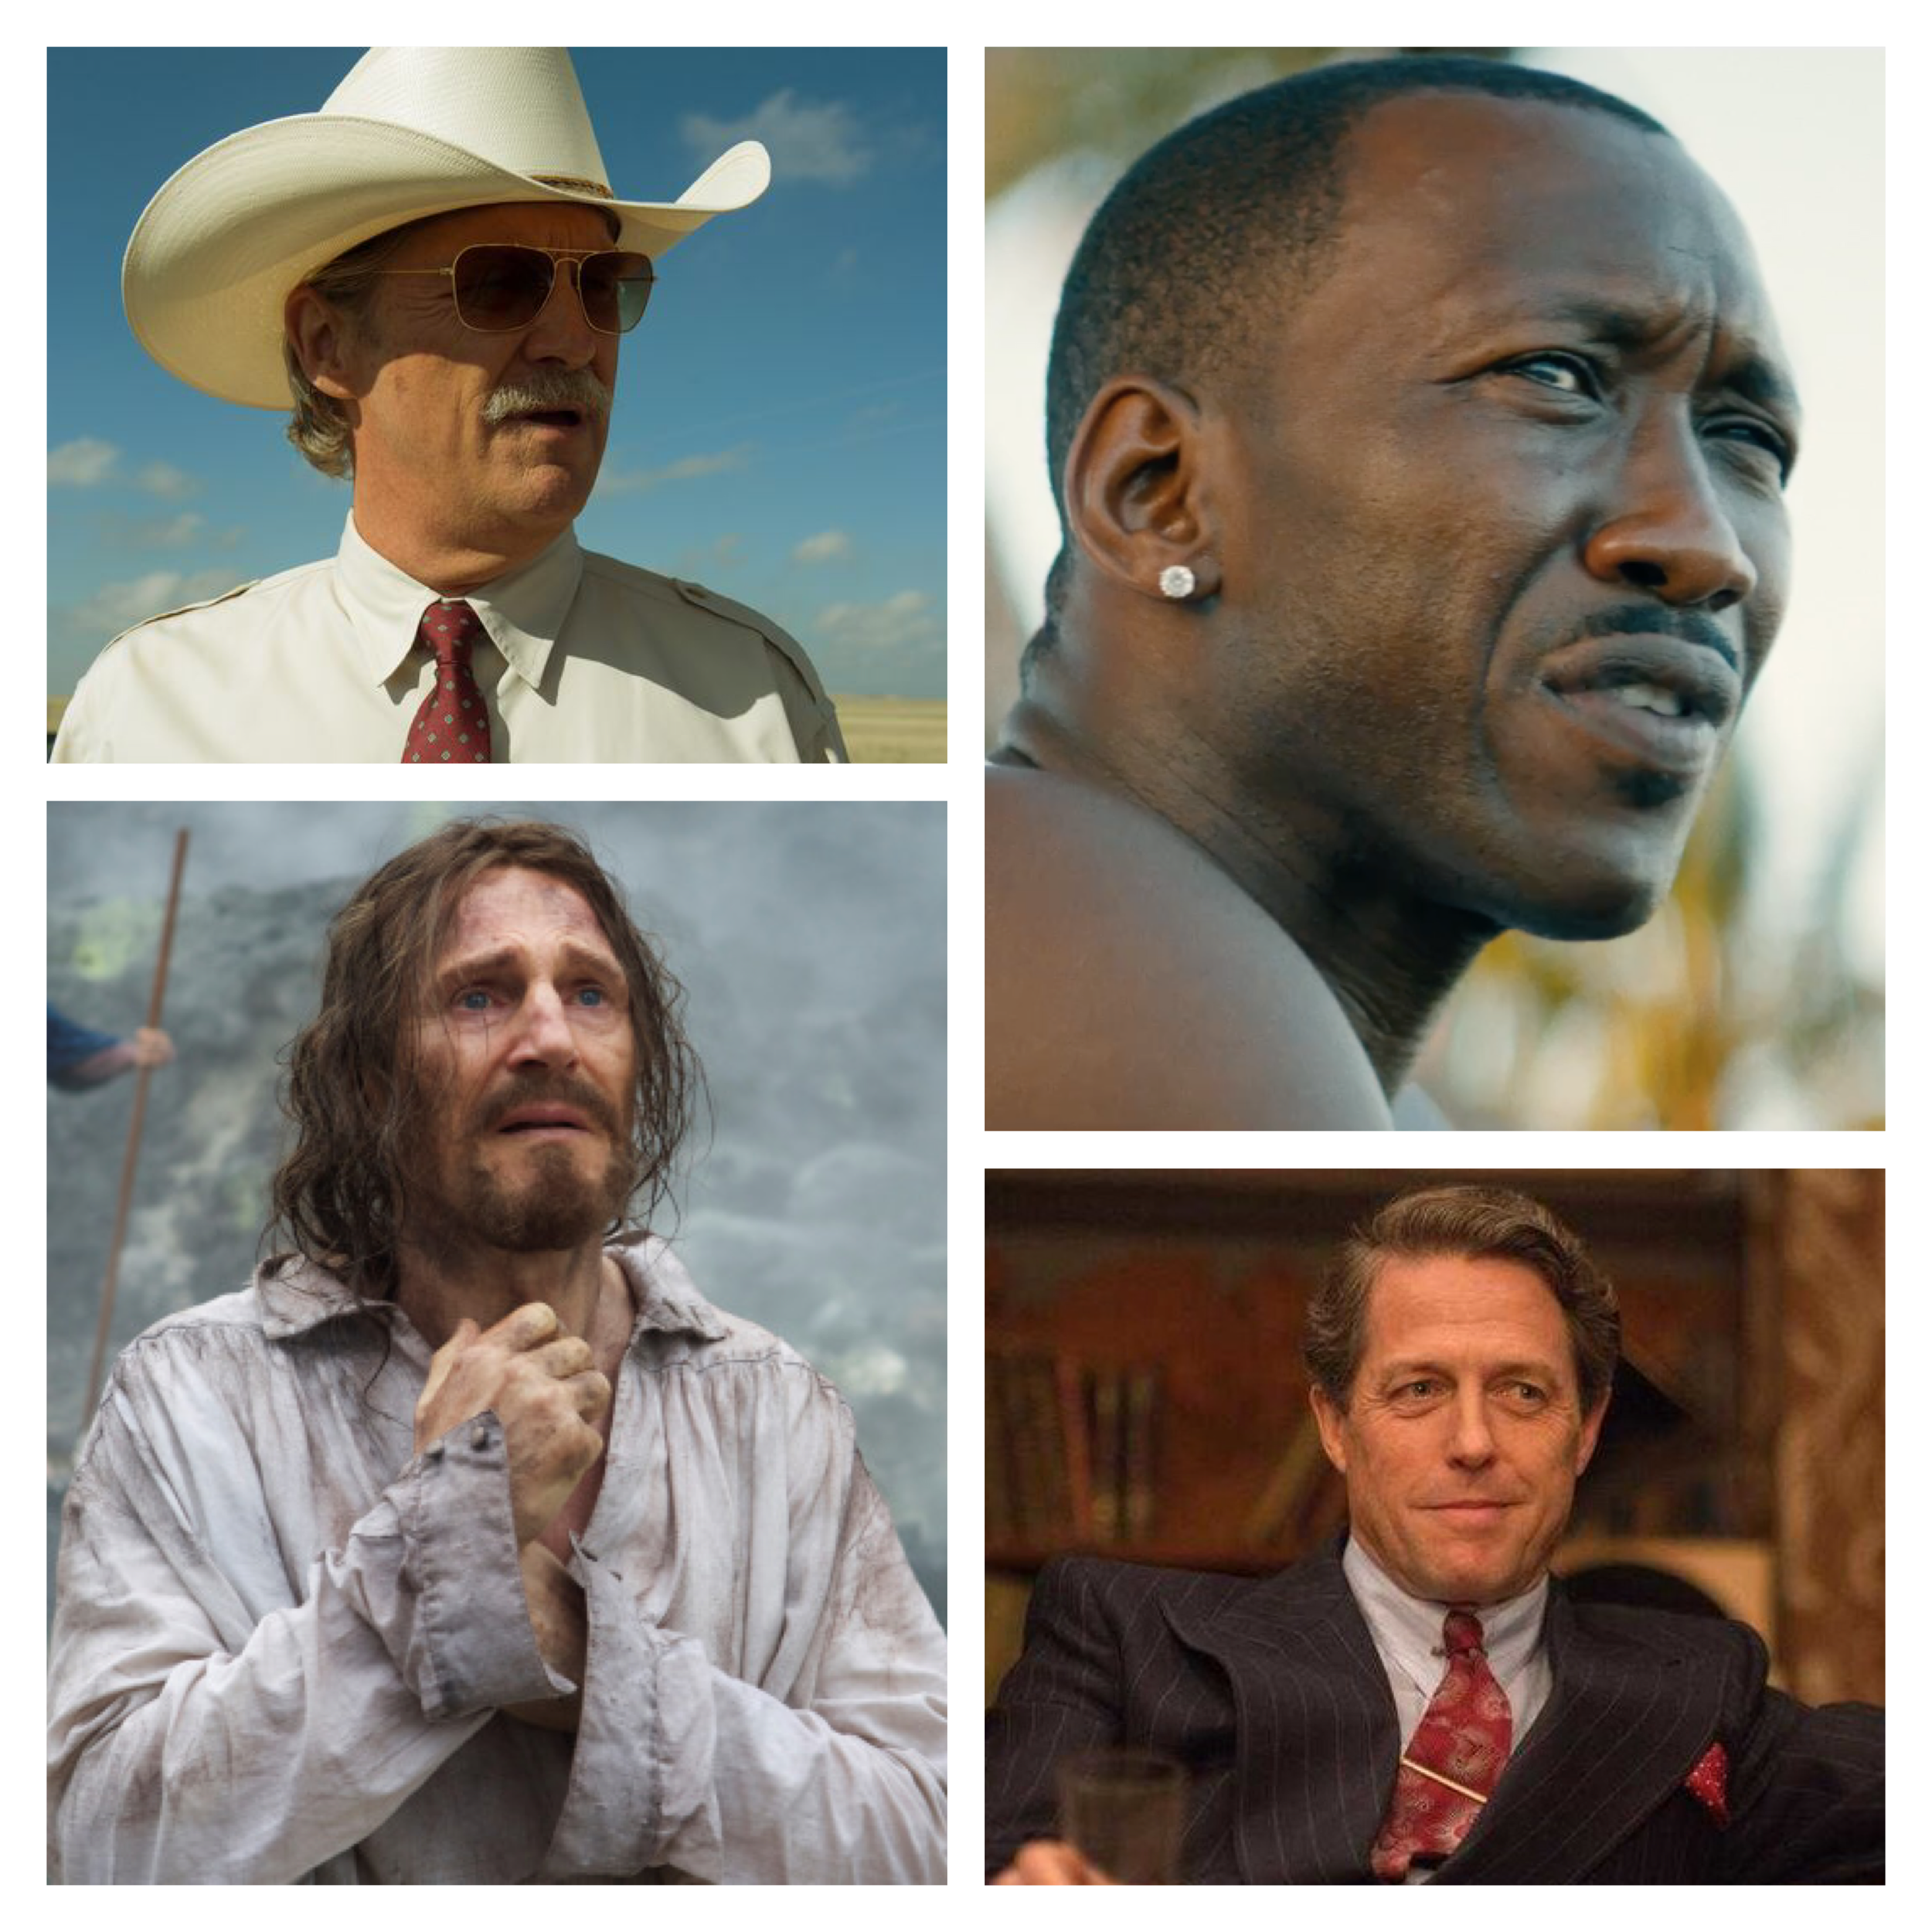 Jeff Bridges,  Hell Or High Water ; Mahershala Ali,  Moonlight ; Liam Neeson,  Silence ; Hugh Grant,  Florence Foster Jenkins